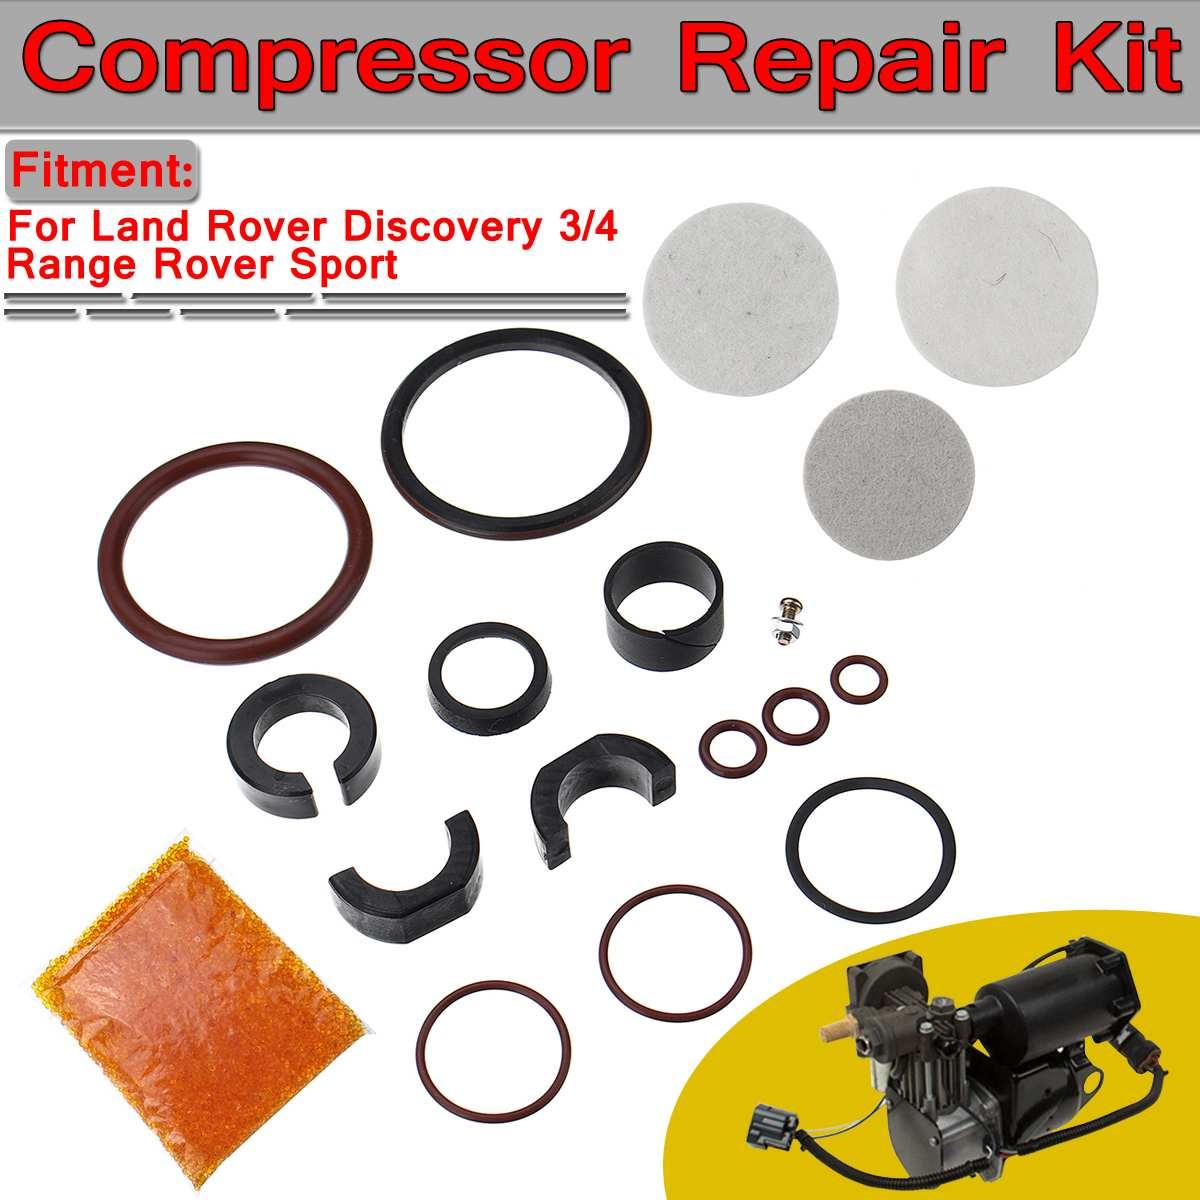 Araba hava süspansiyon A/C kompresör tamir kiti Land Rover Discovery 3/4 Range Rover Sport RQG000017 RQG000018 RQG000019